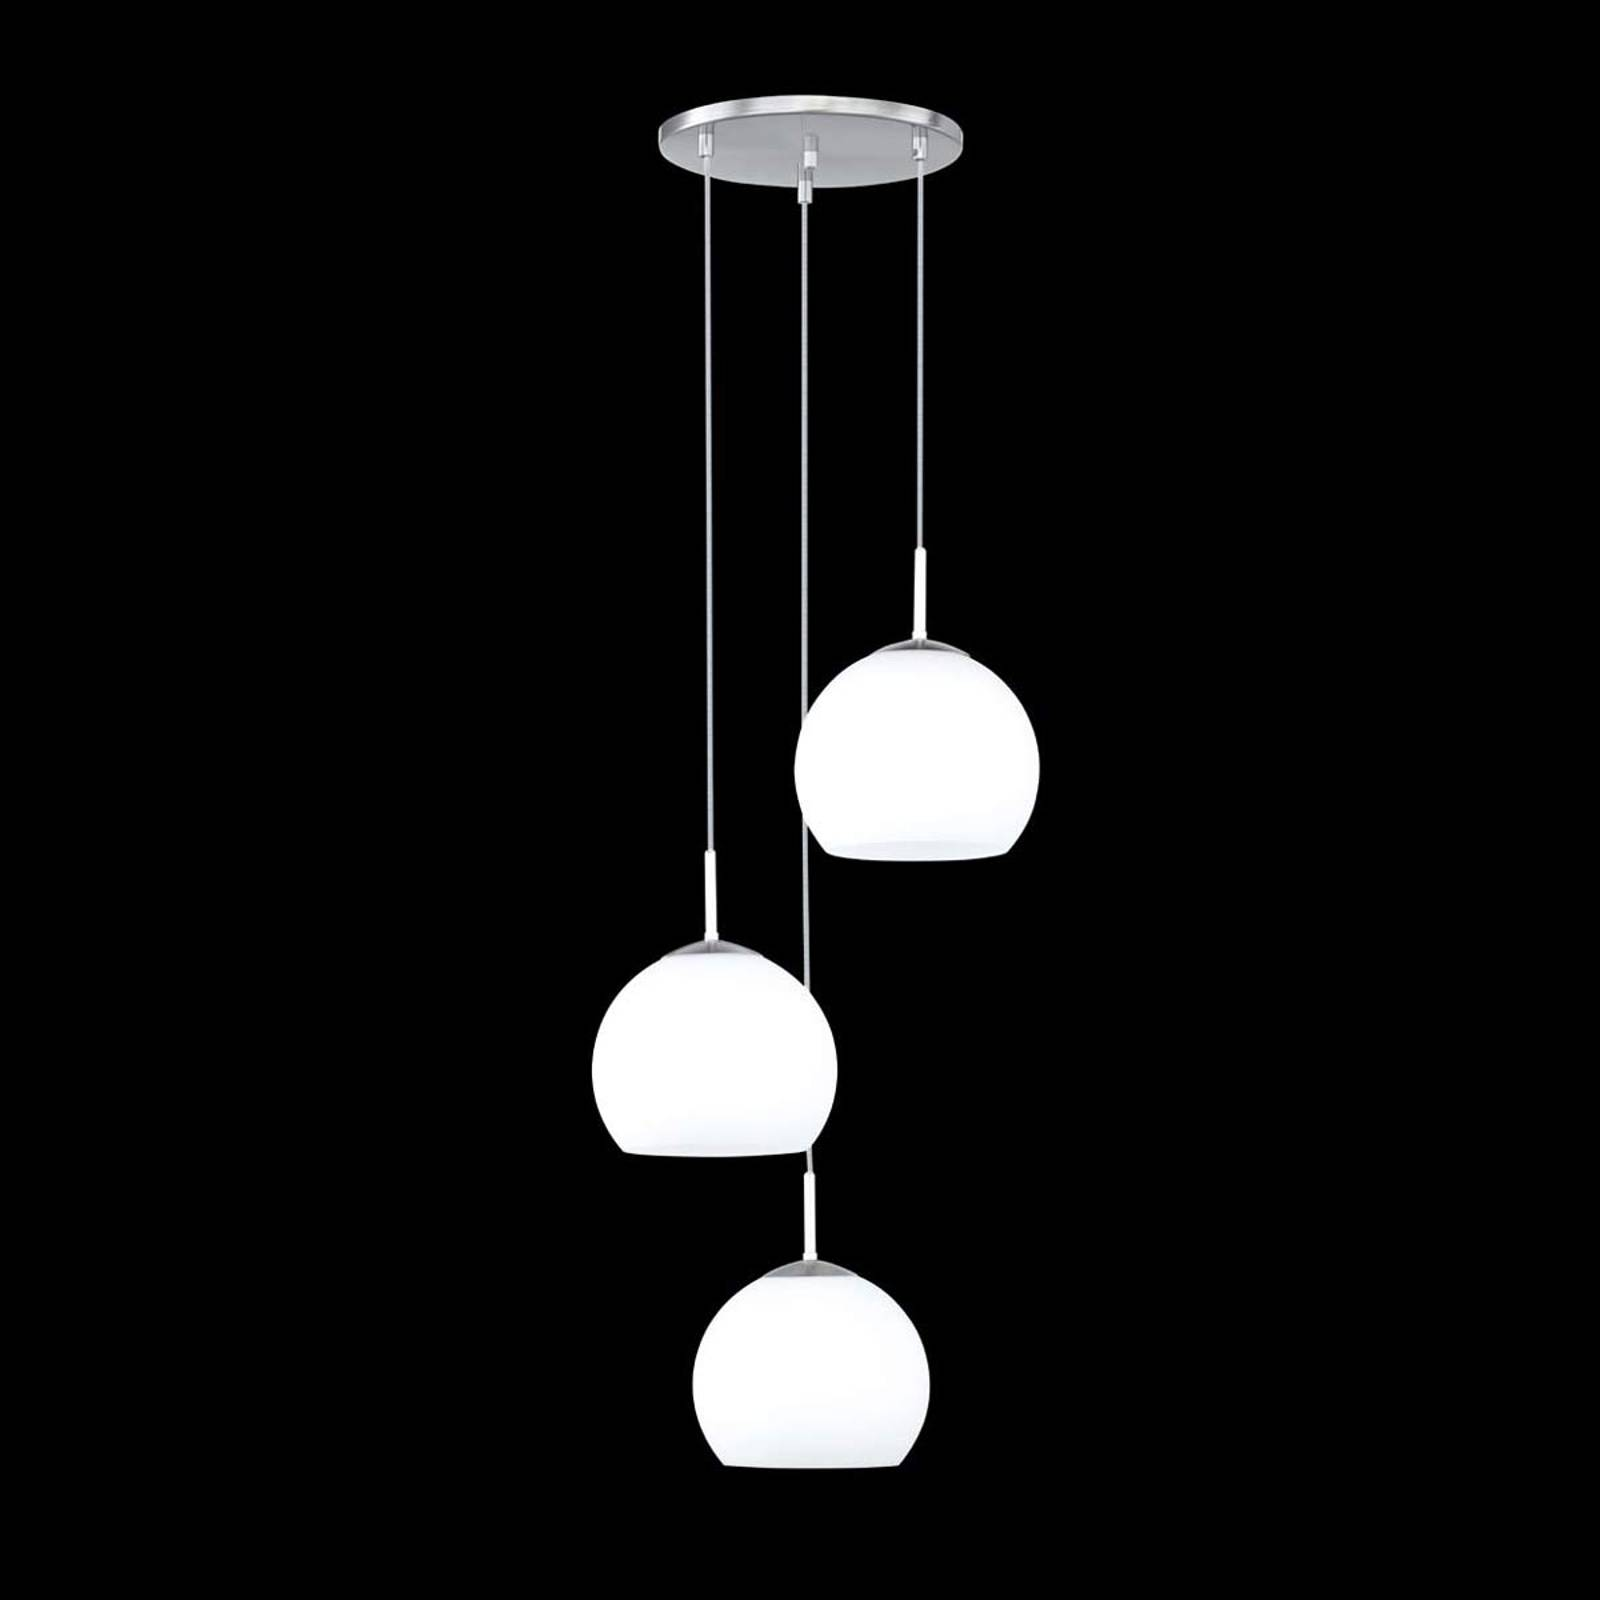 Hanglamp Bolero met 3 lampjes, rond